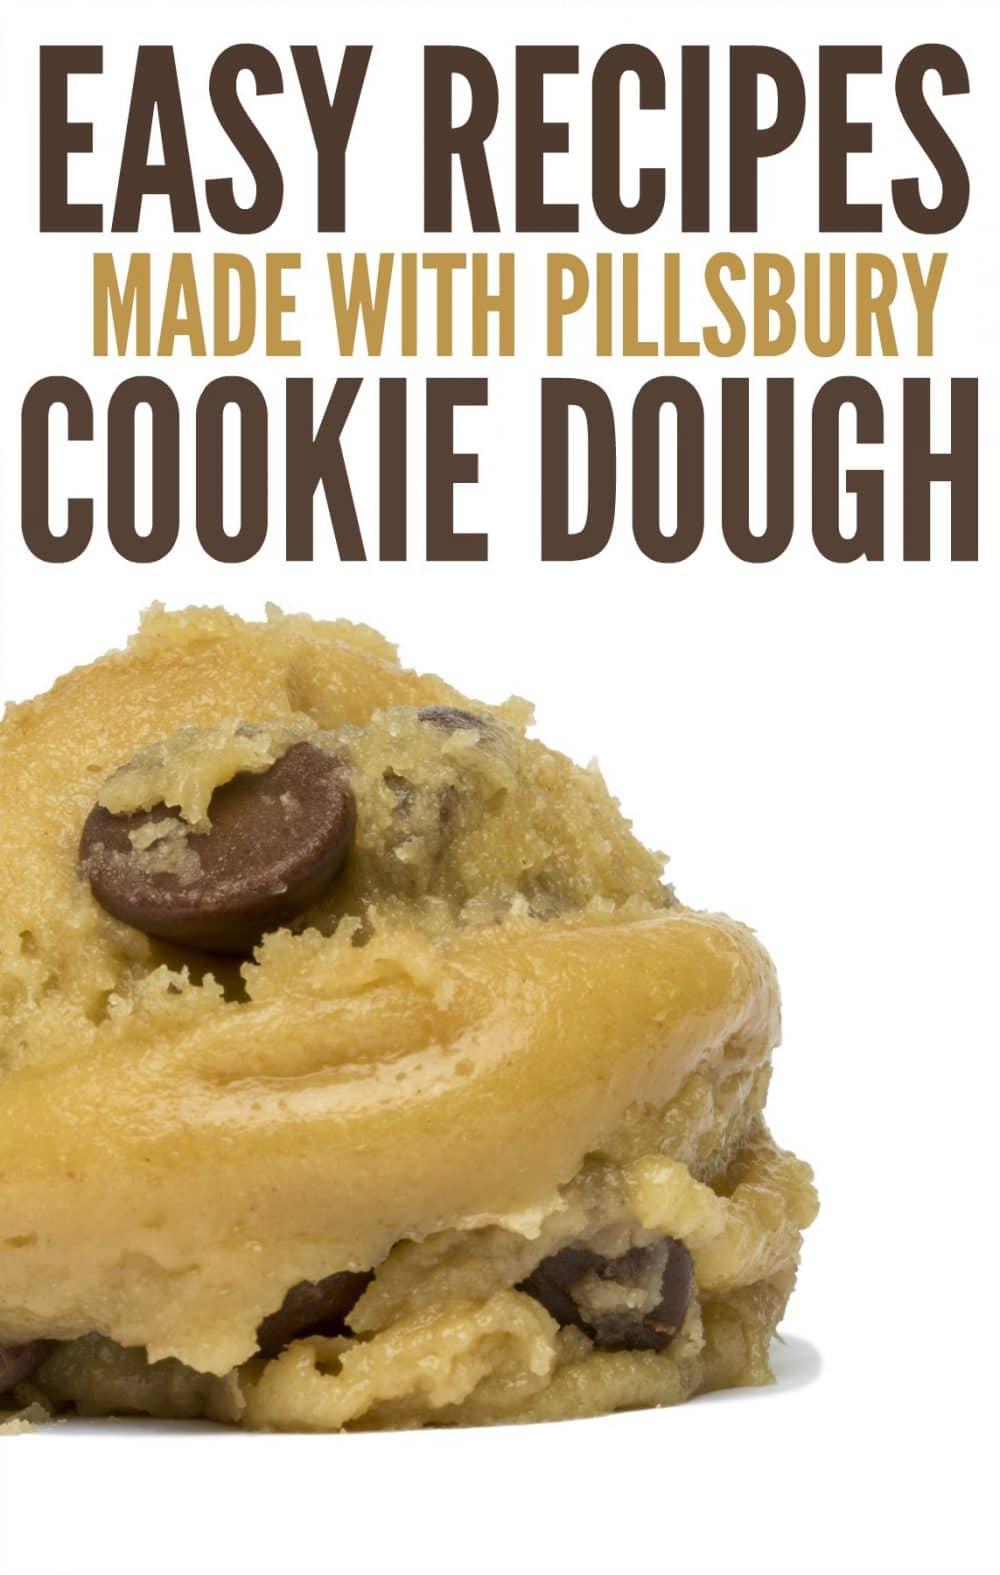 Pillsbury Cookie Dough Recipes Christmas : pillsbury, cookie, dough, recipes, christmas, Recipes, Pillsbury, Cookie, Dough, Family, Travel